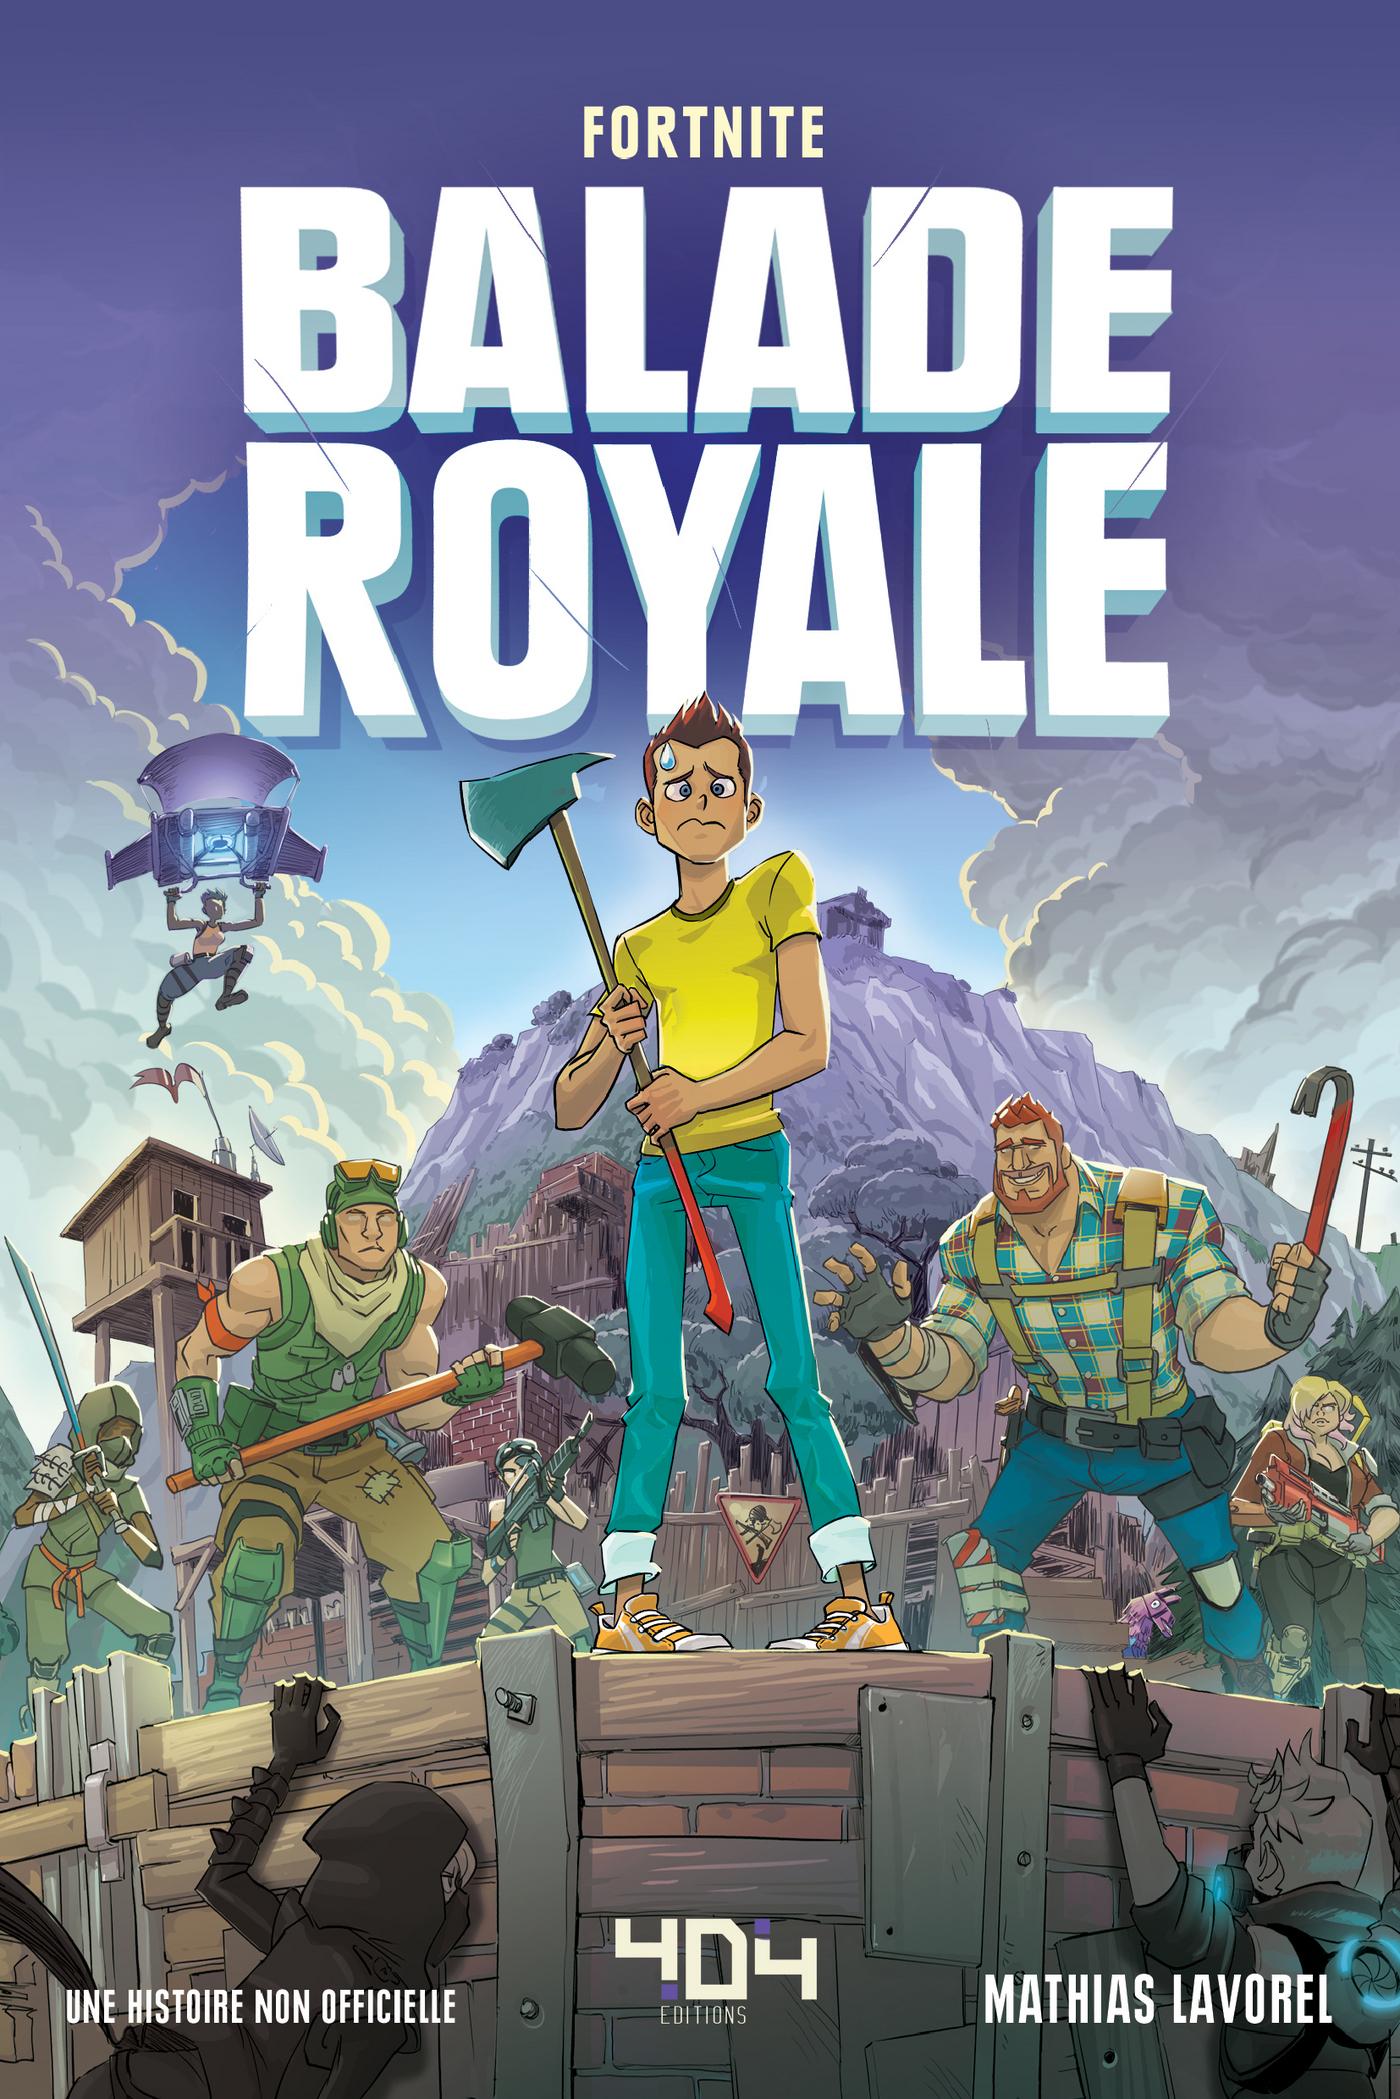 Fortnite - Balade Royale